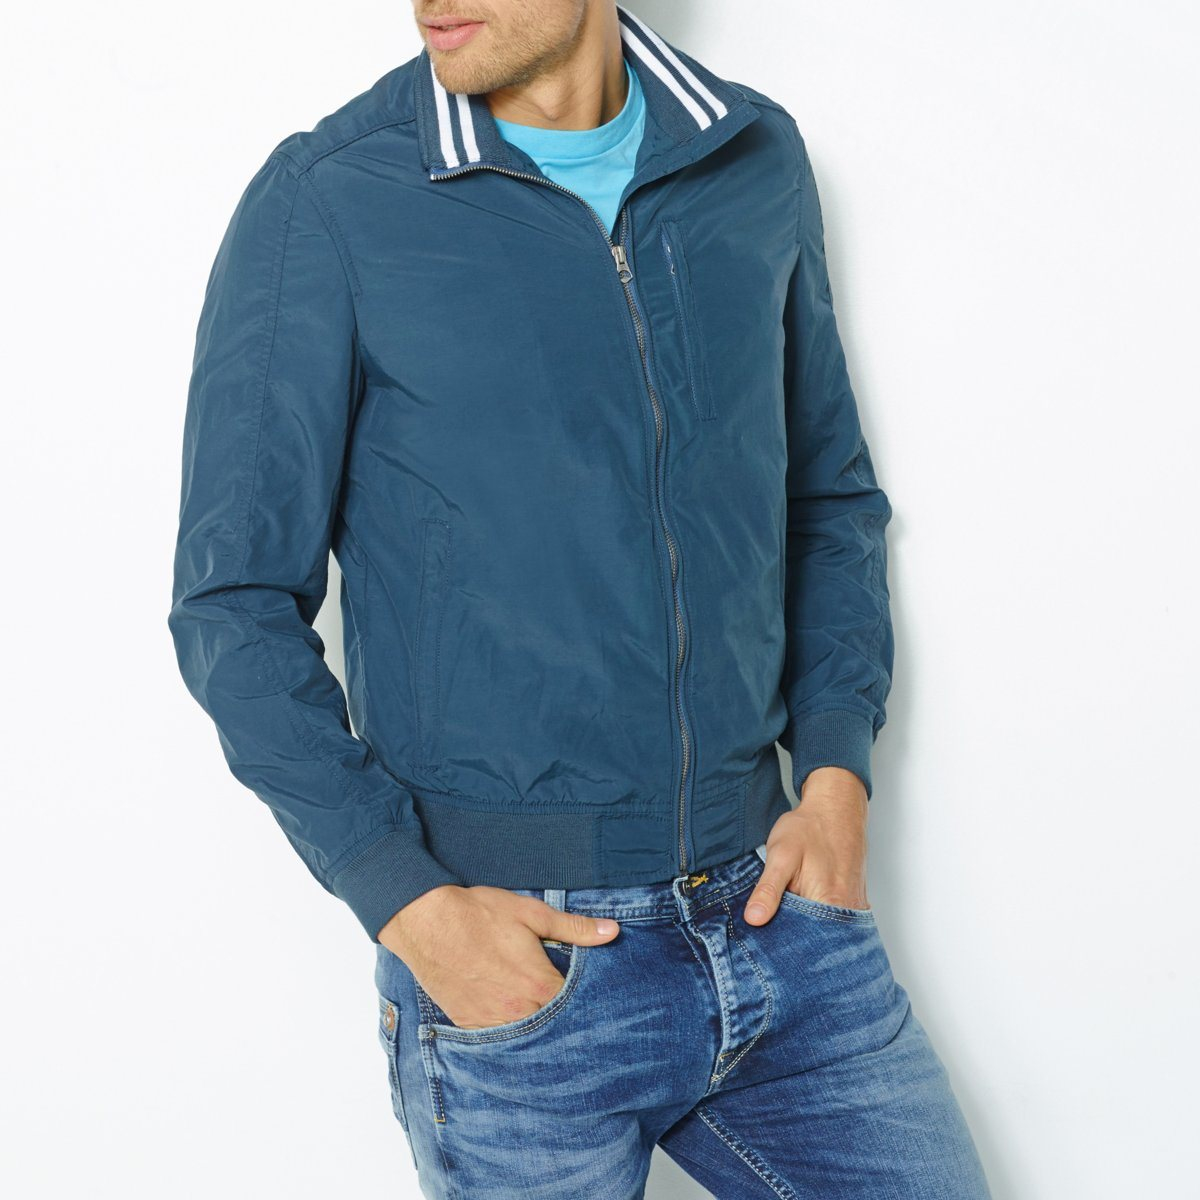 Pepe jeans jacke borges